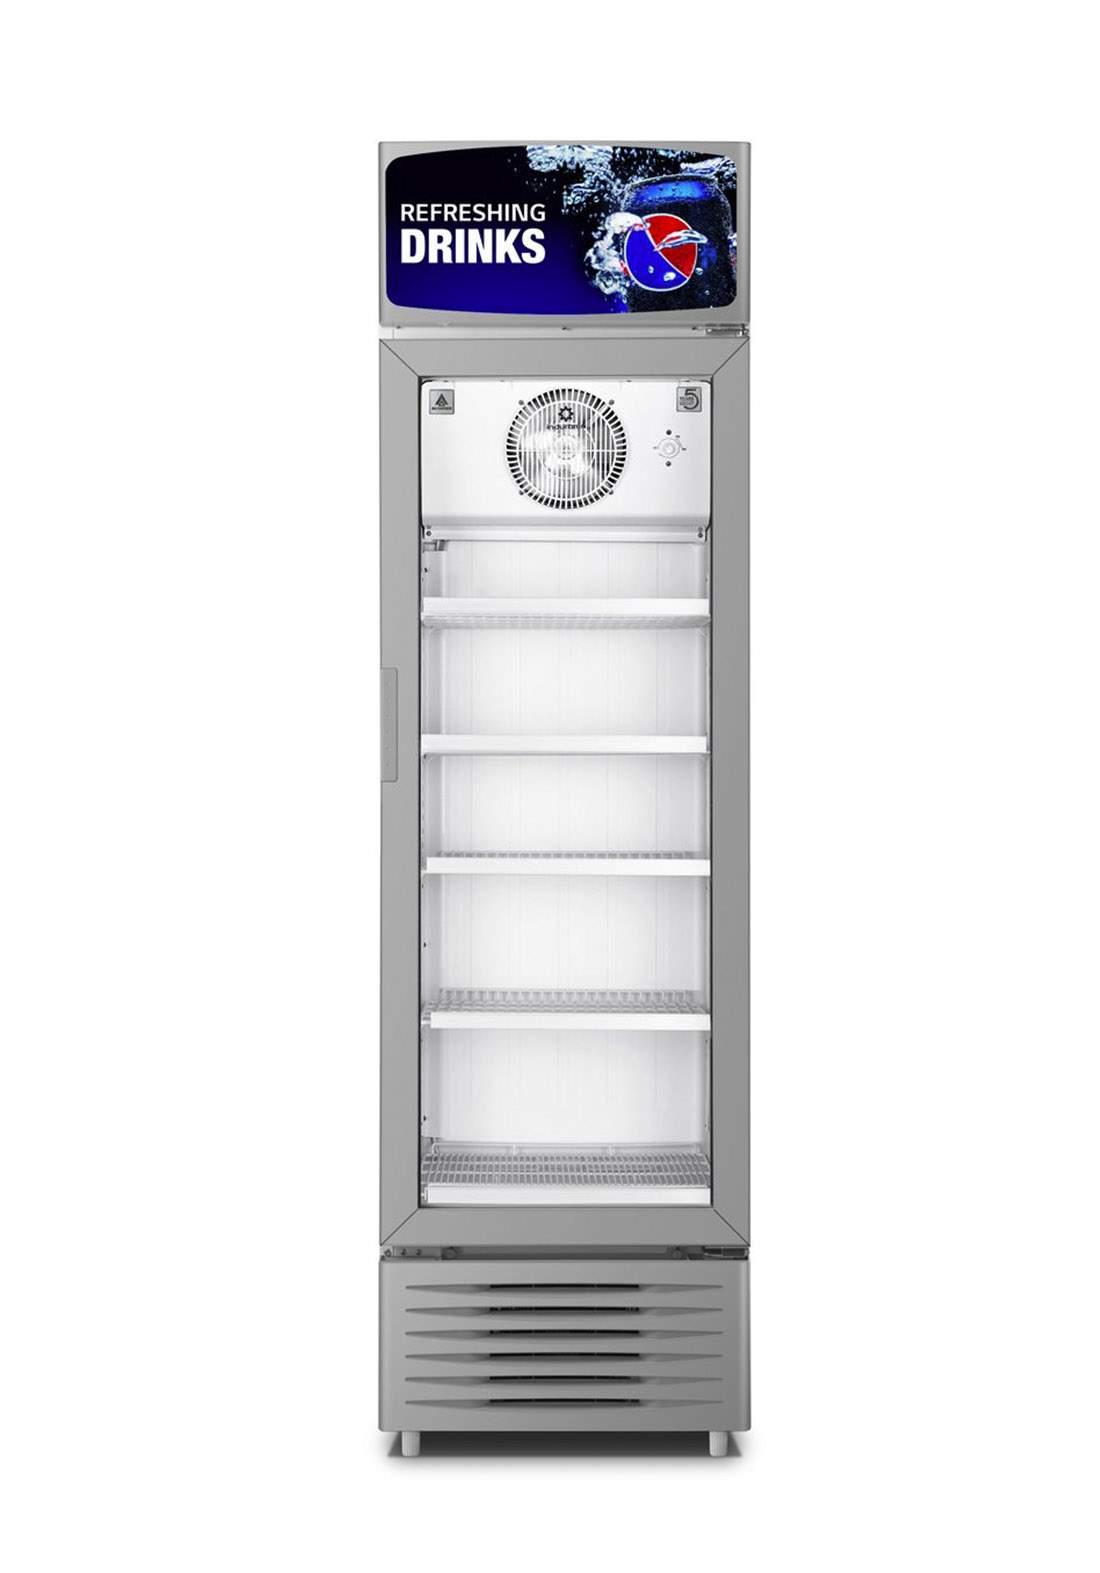 Alhafidh (9USC595) 21cf Direct Cool Upright Showcase Refrigerator ثلاجة عارضة